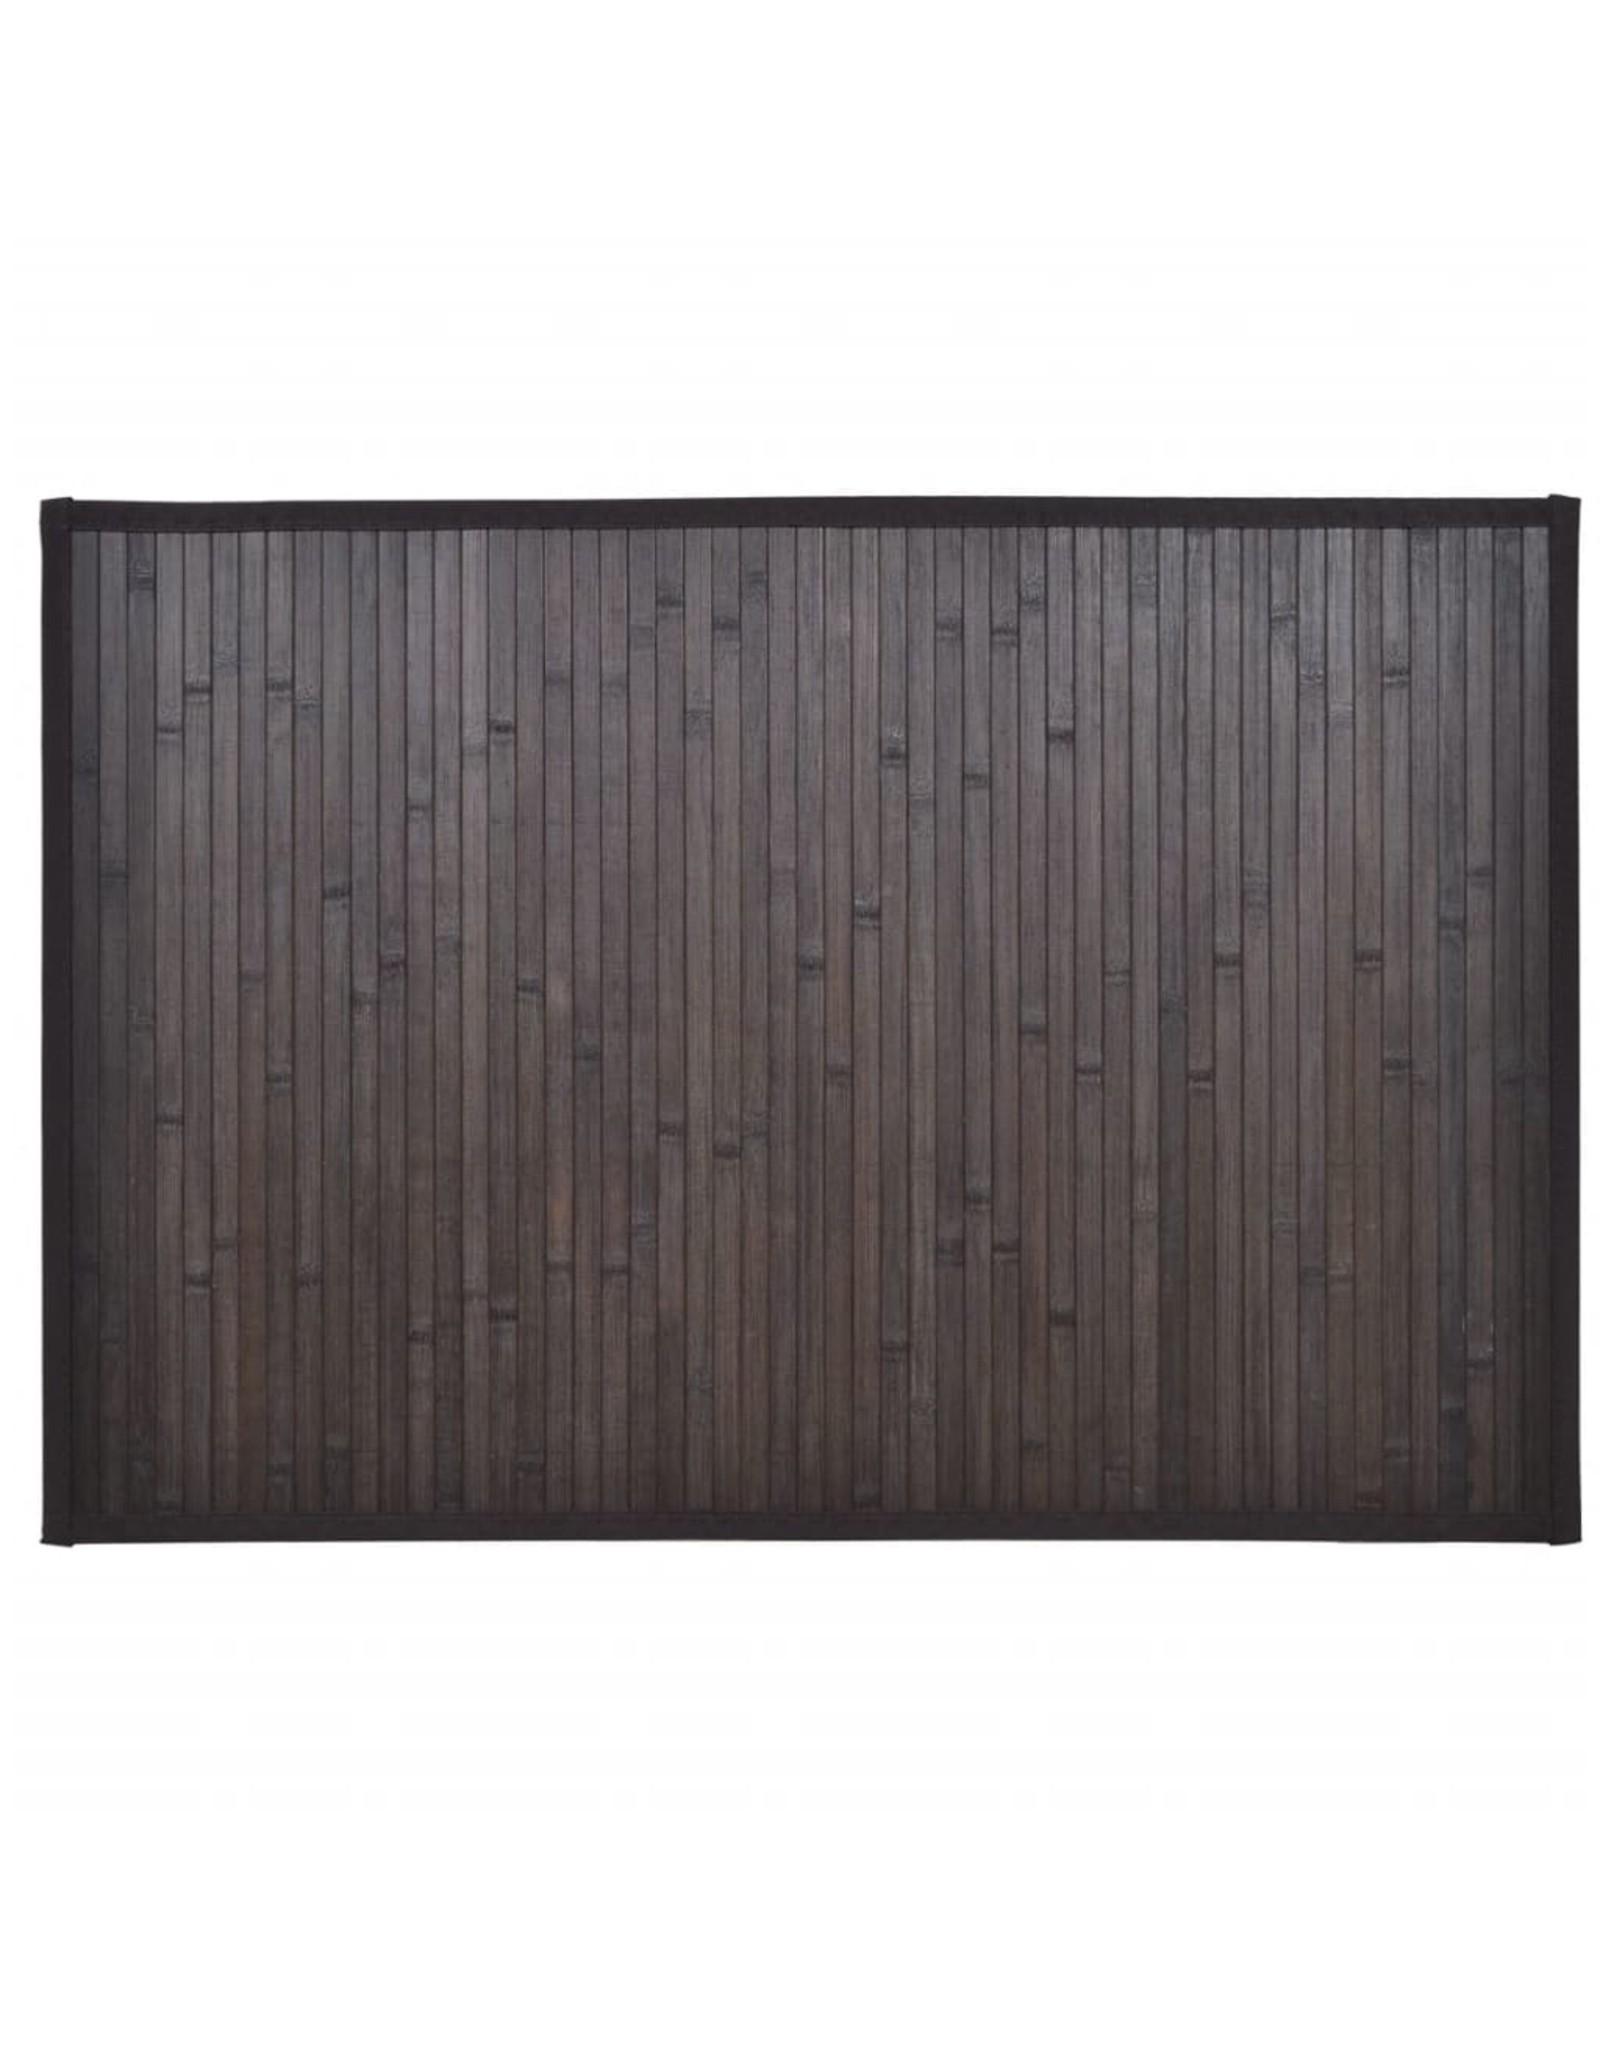 Badmatten 8 st 40x50 cm bamboe donkerbruin